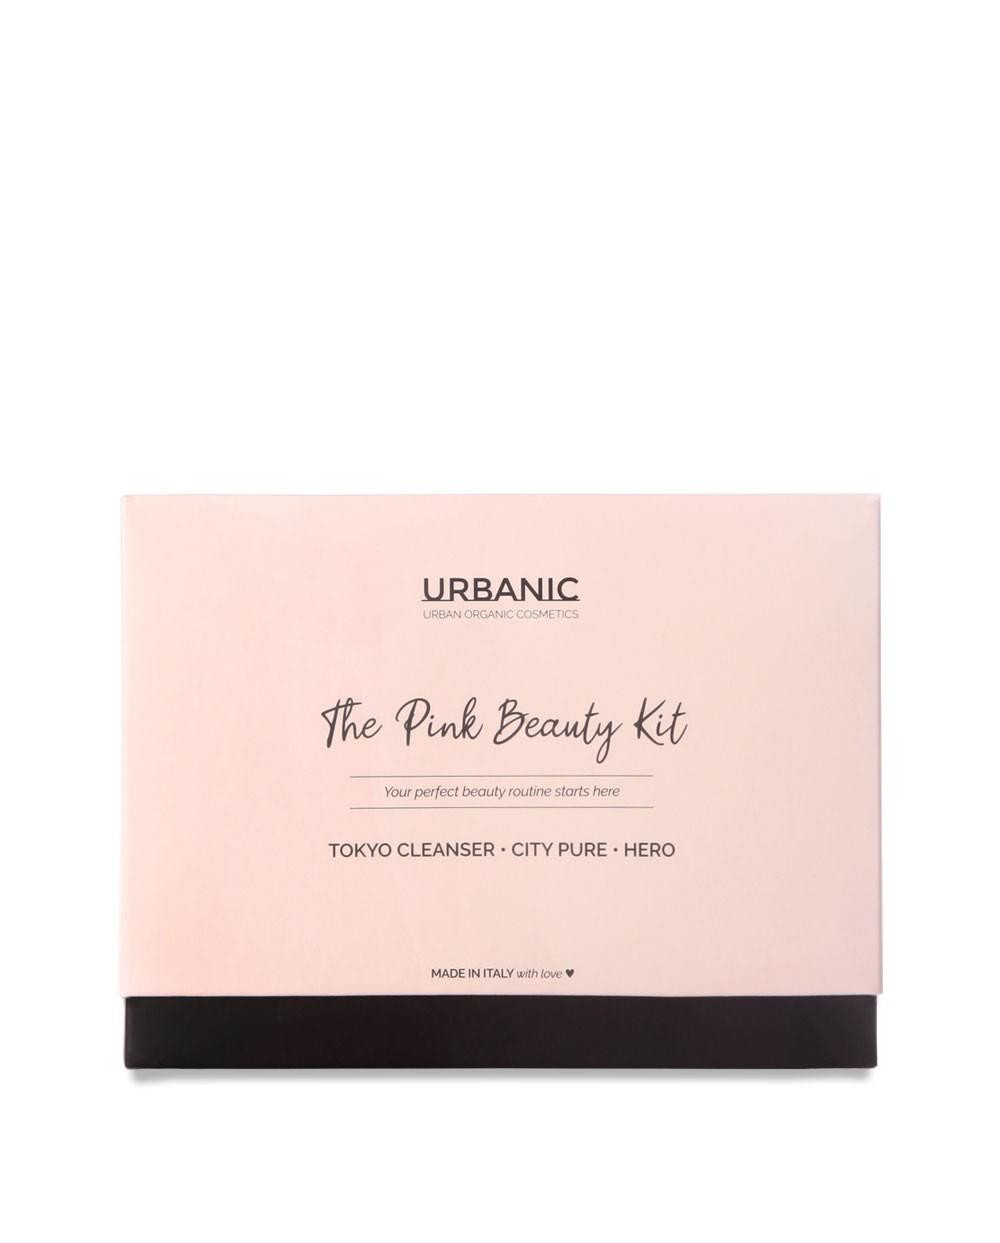 The Pink Beauty Kit